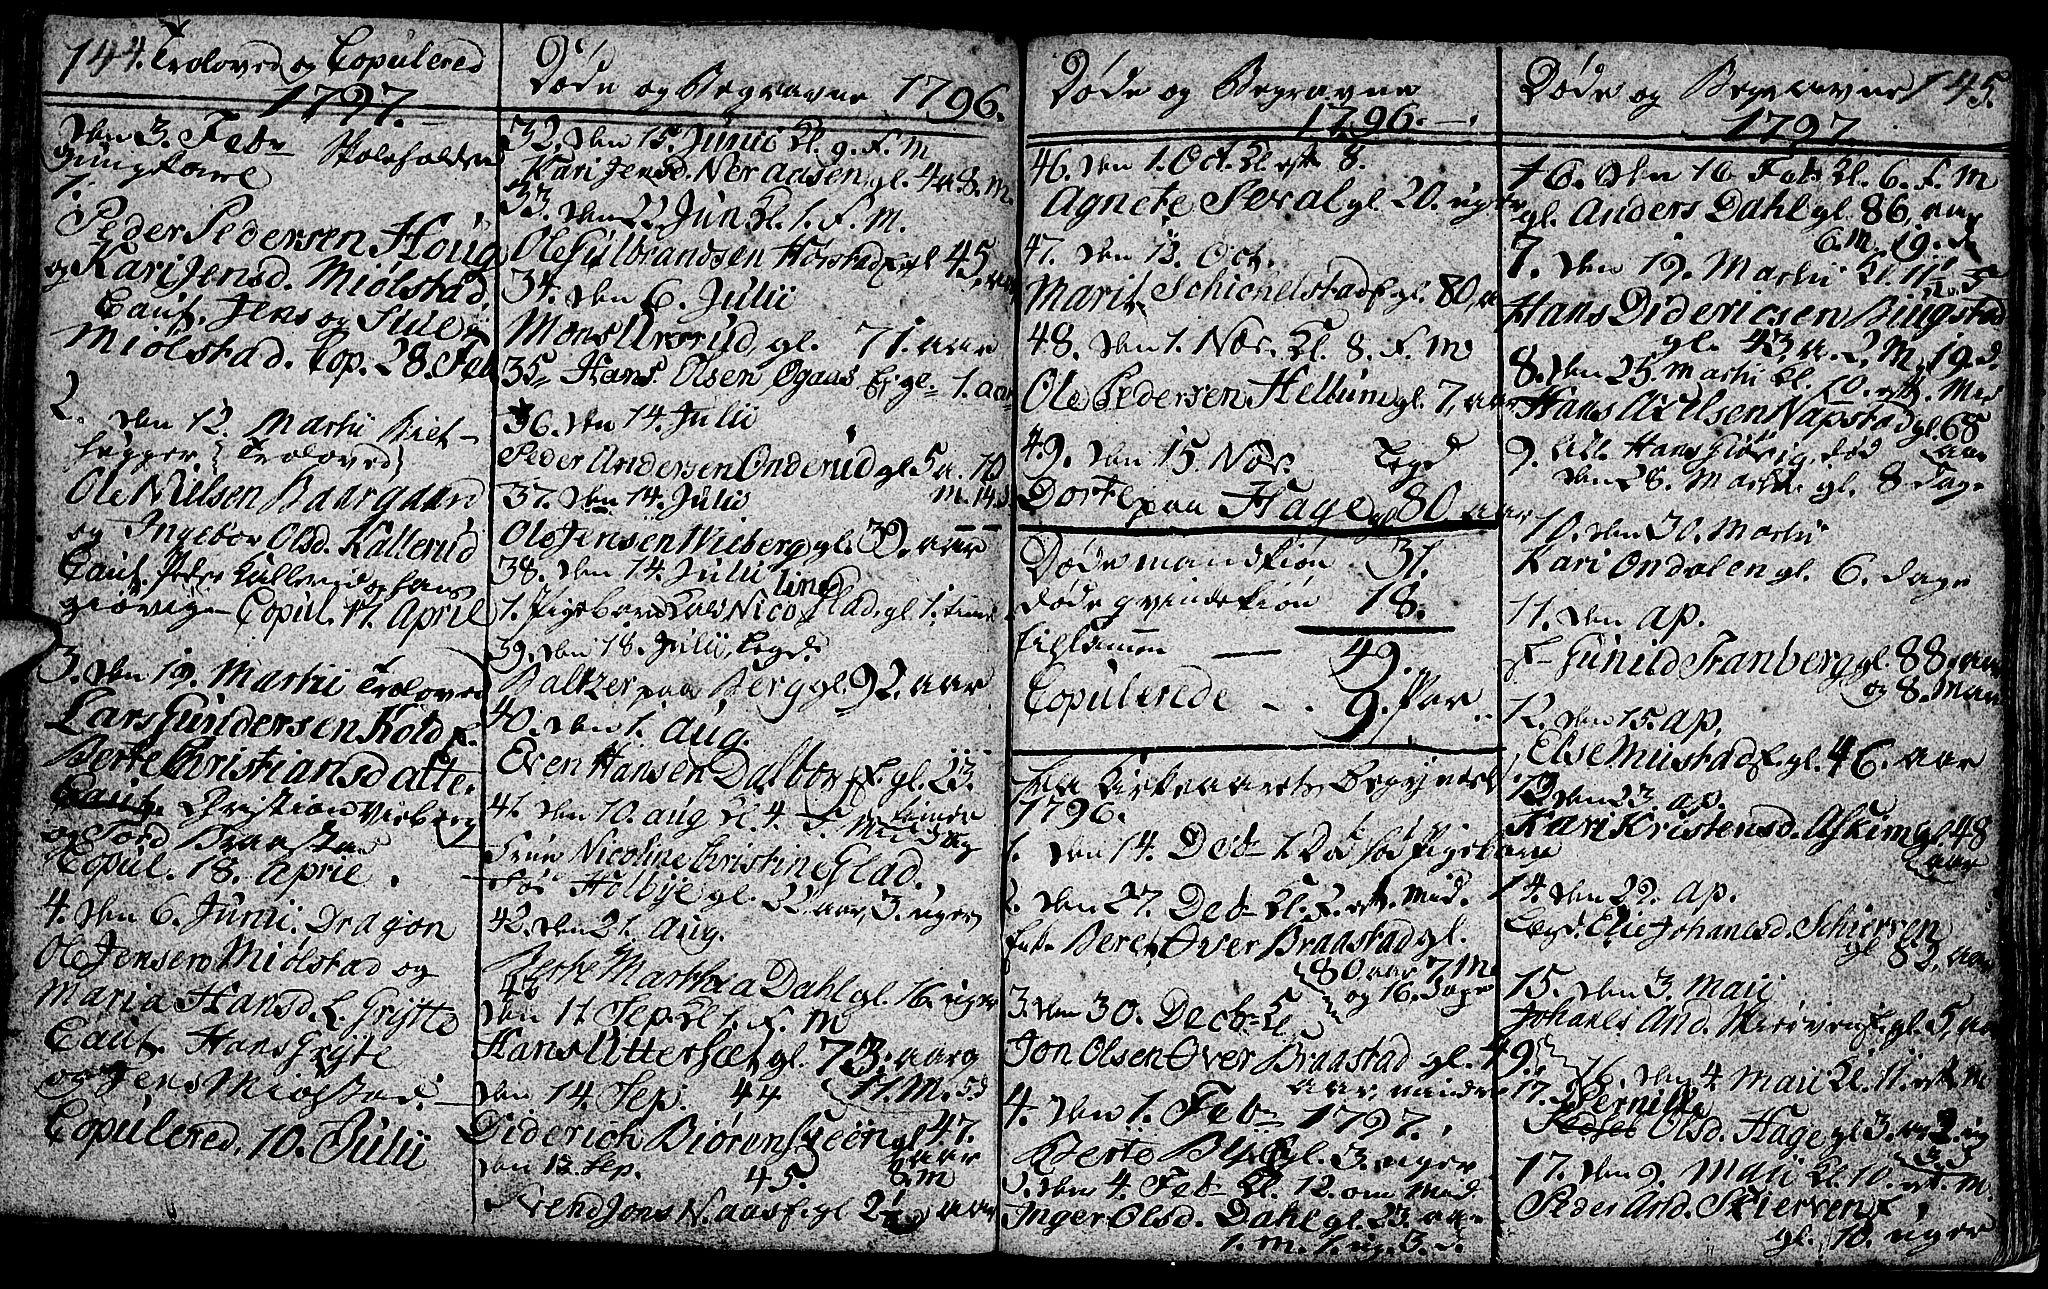 SAH, Vardal prestekontor, H/Ha/Hab/L0002: Klokkerbok nr. 2, 1790-1803, s. 144-145